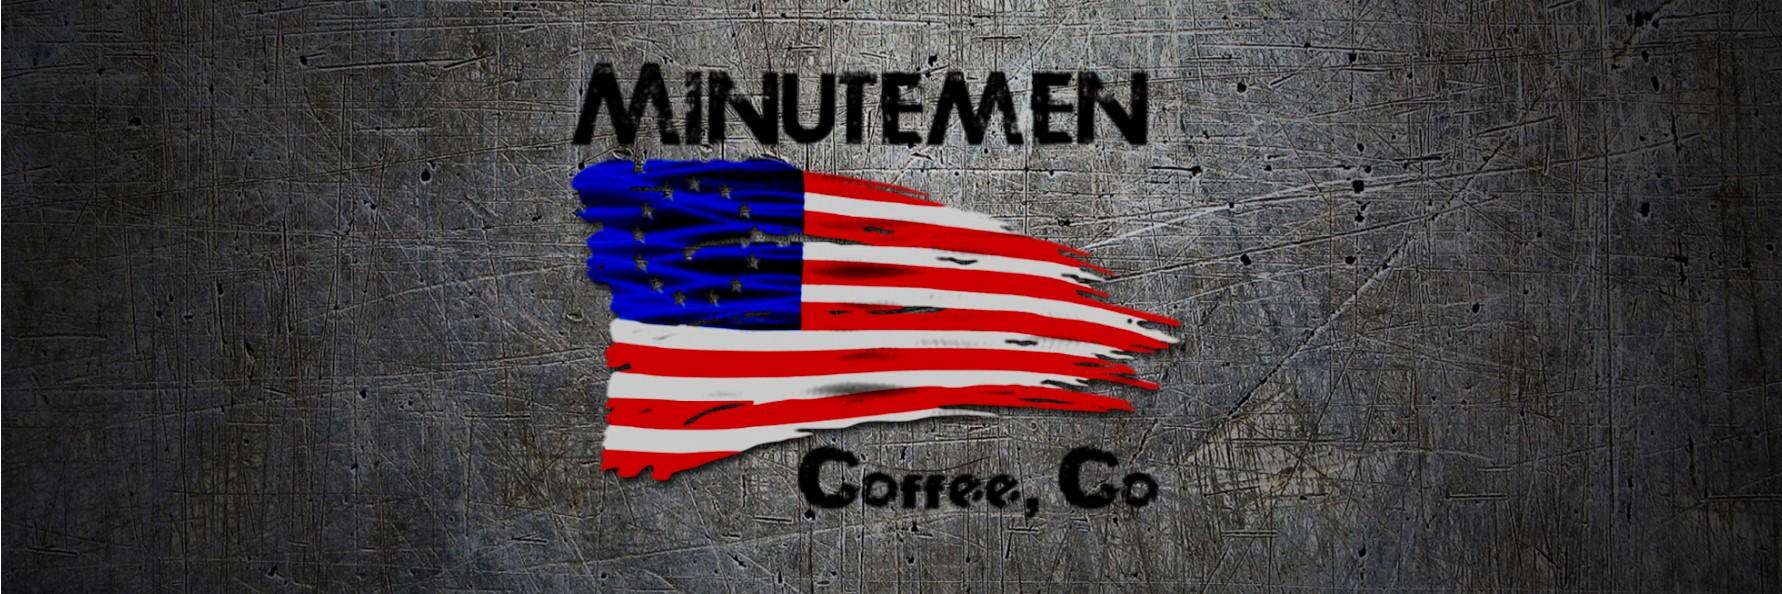 https://www.patriotqm.com/catalog/coffee/minutemen-coffee